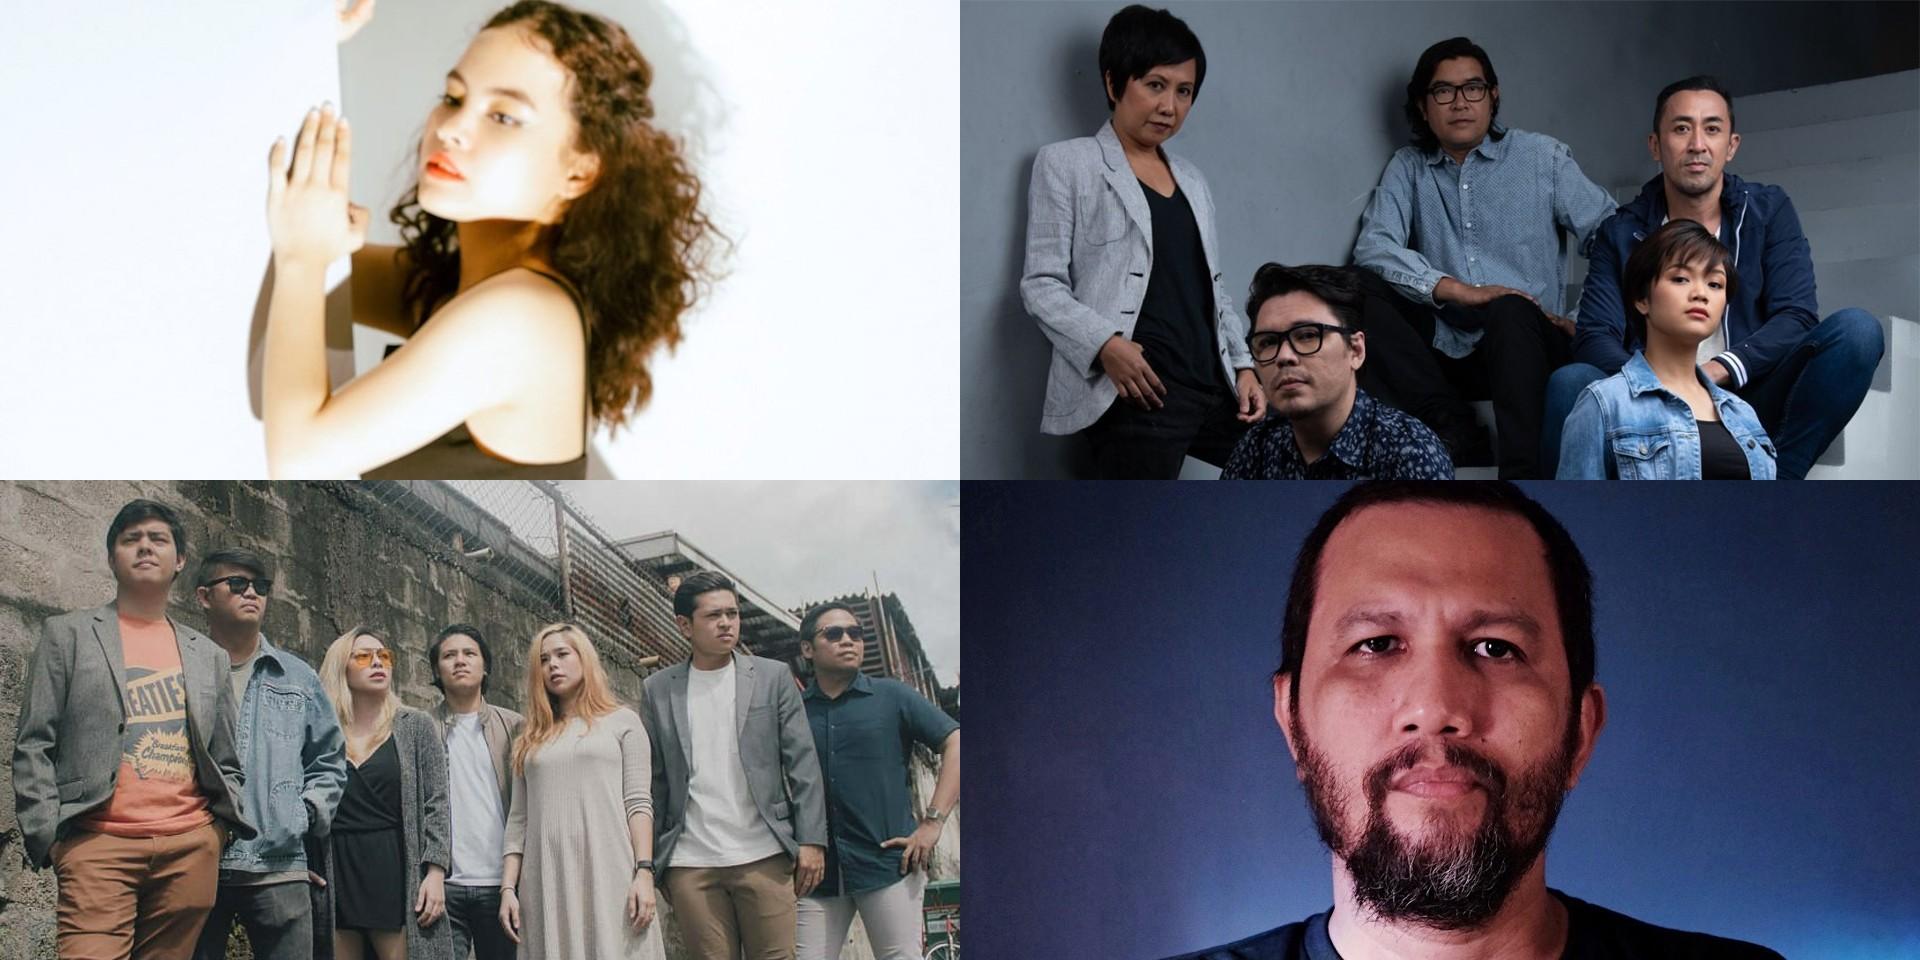 Imago, Shanne Dandan, Cheats, Johnoy Danao, and more release new music – listen